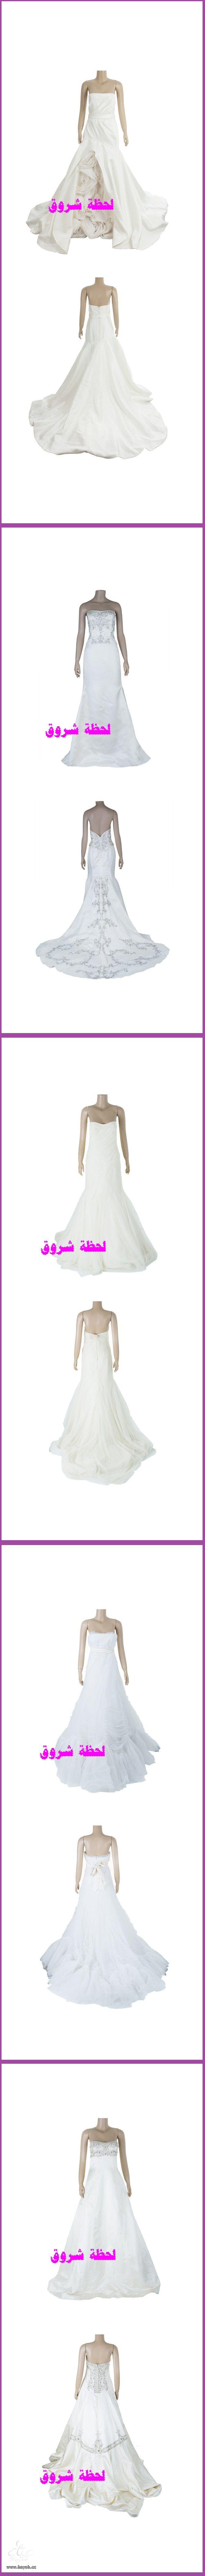 صور فساتين زفاف hayahcc_1451762233_780.jpg